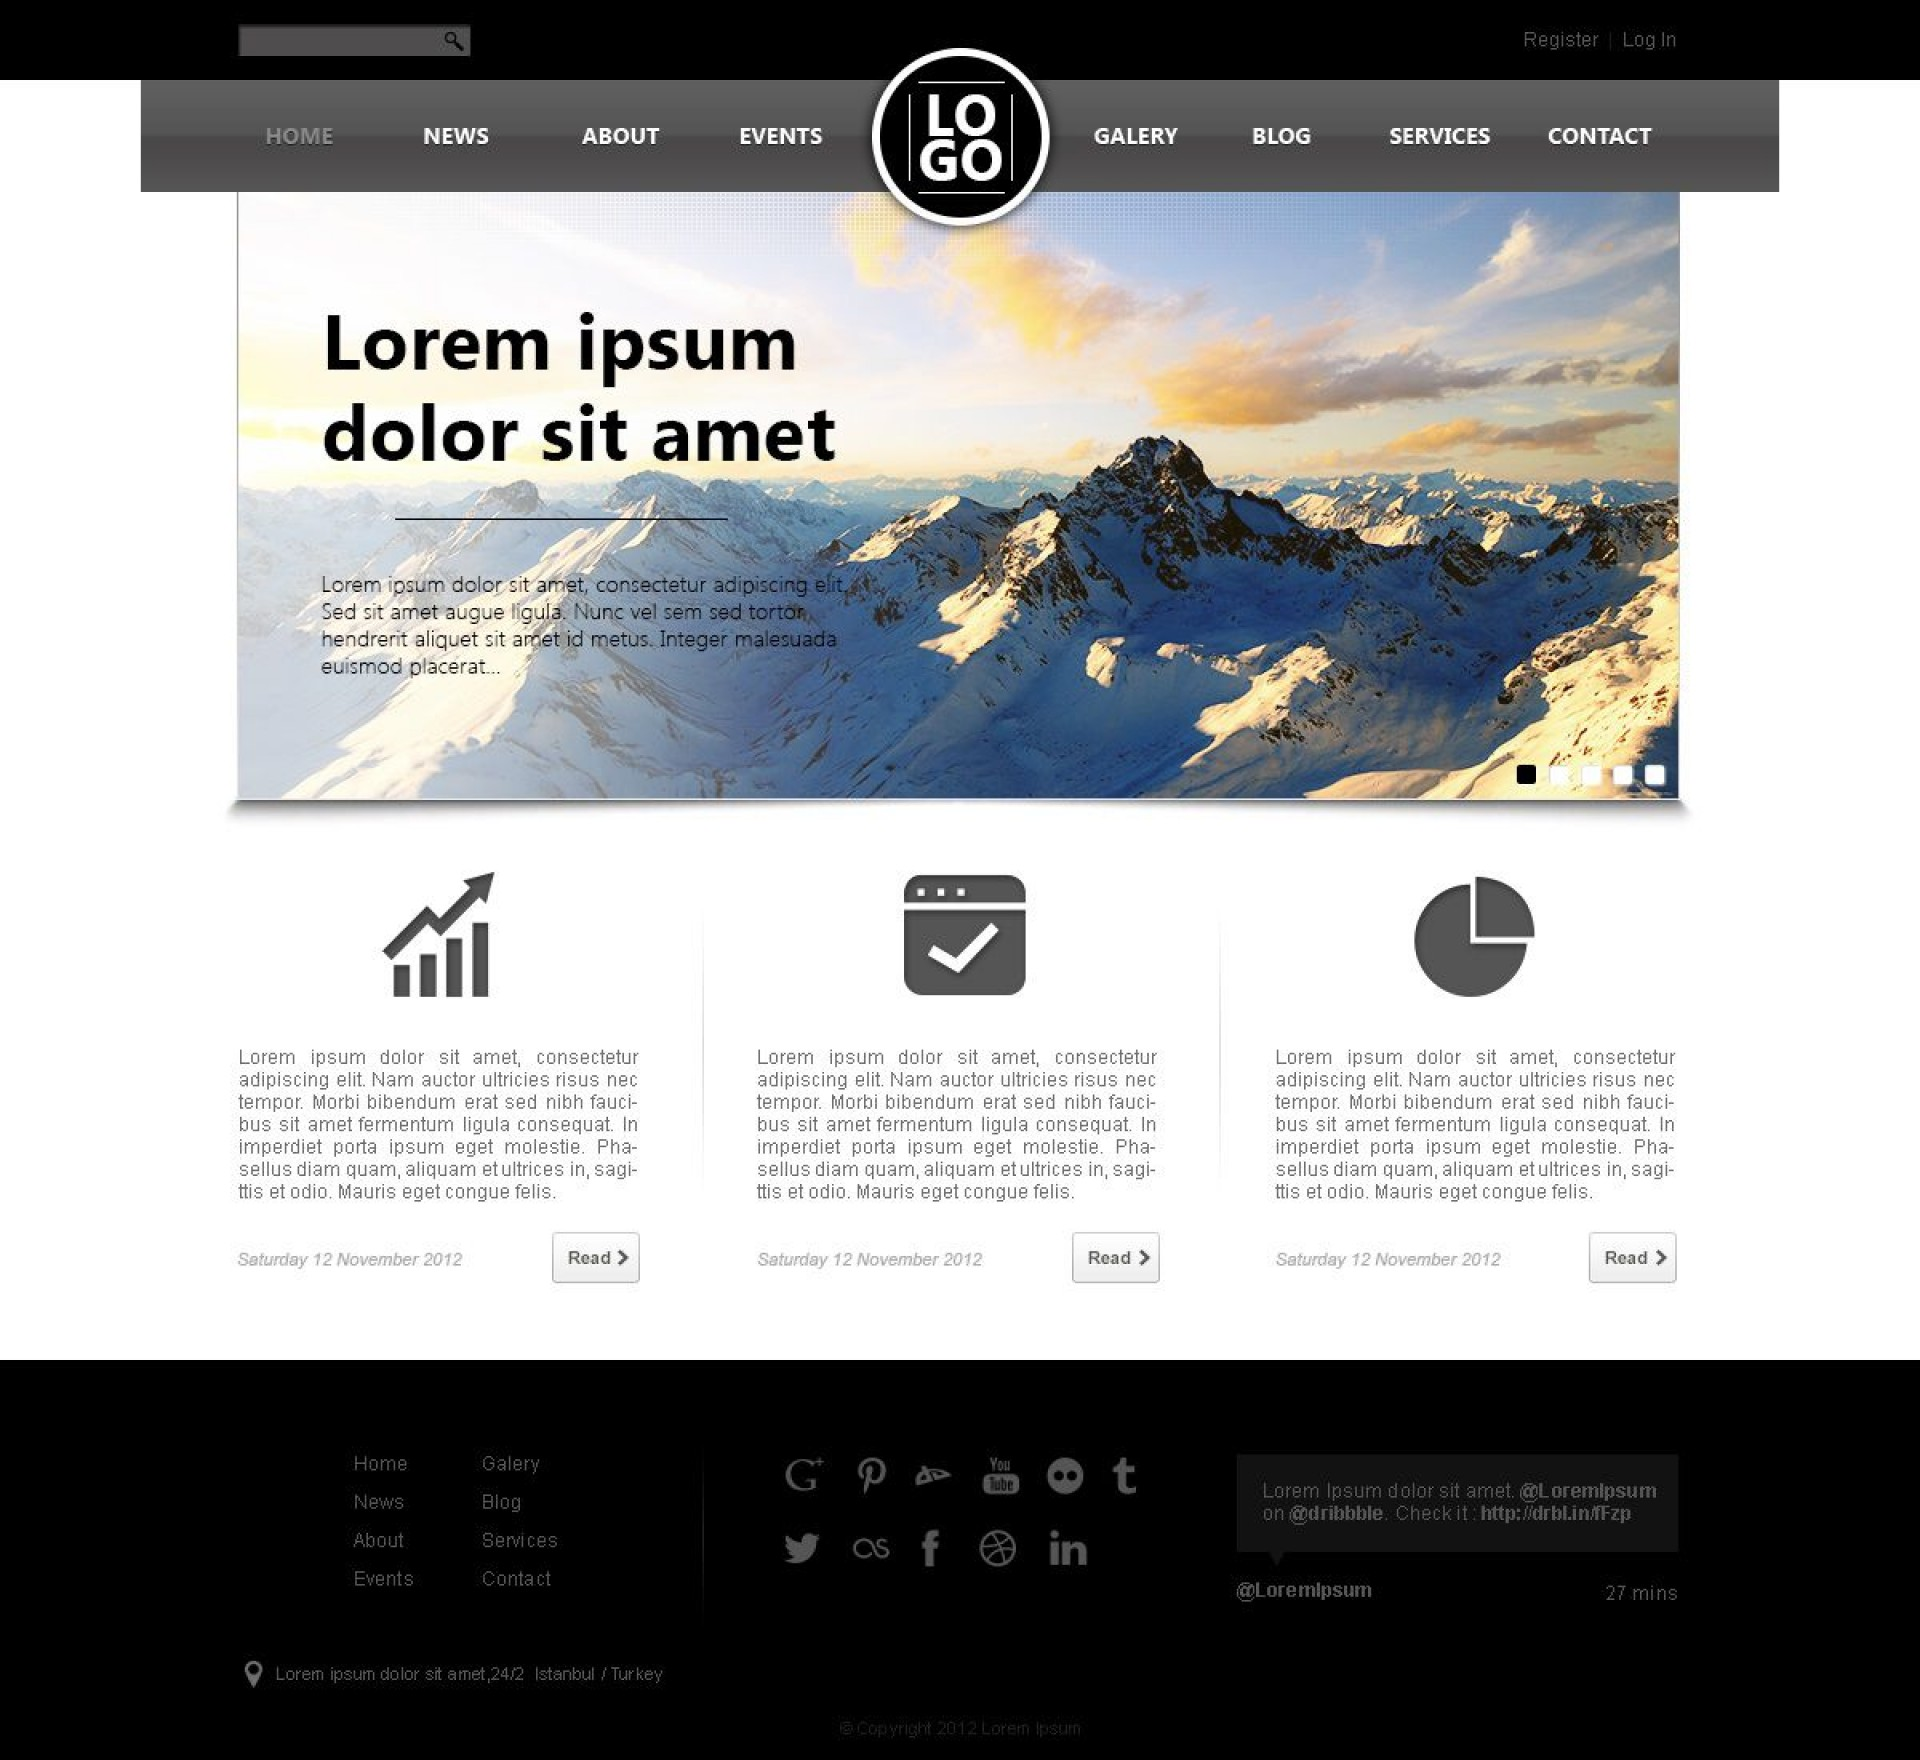 005 Stunning Website Design Template Free Photo  Asp.net Web Download Psd1920